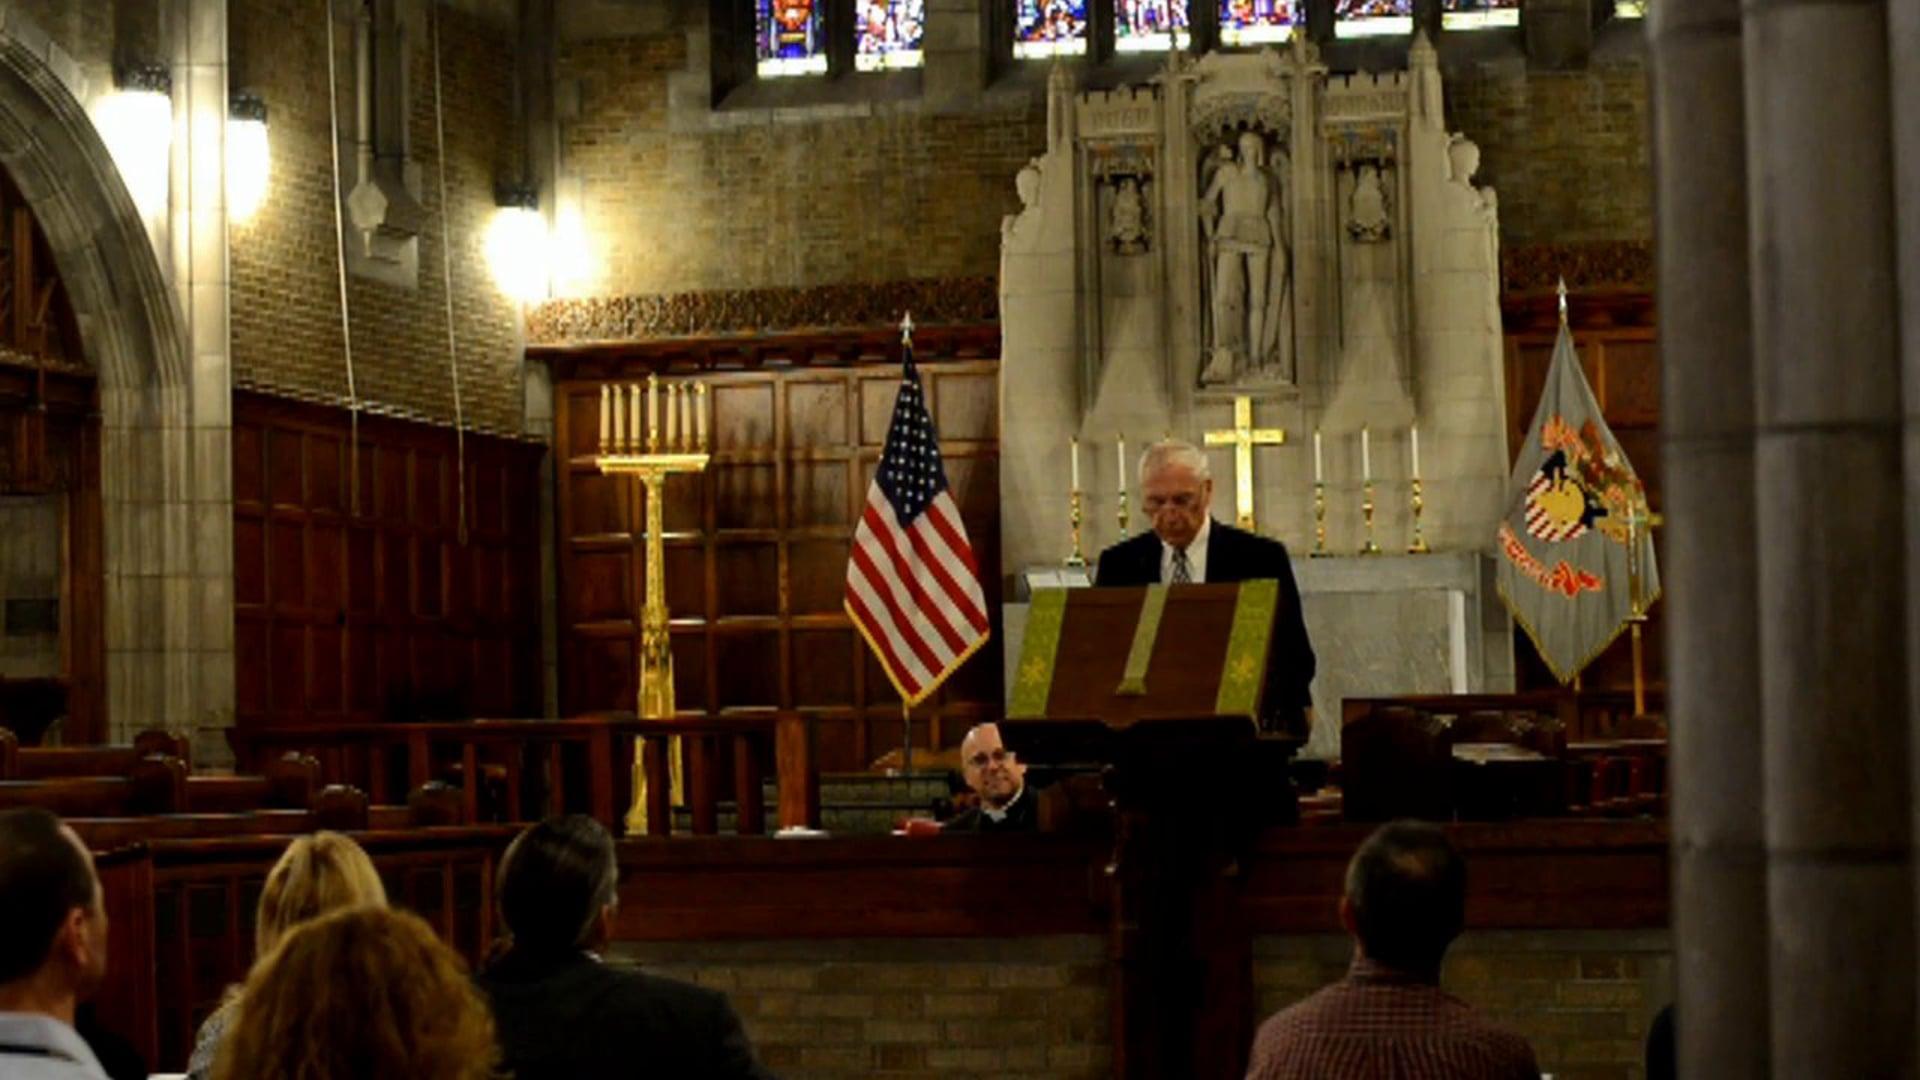 Chaplain Camp's address at USMA '83 30th Reunion Memorial Service